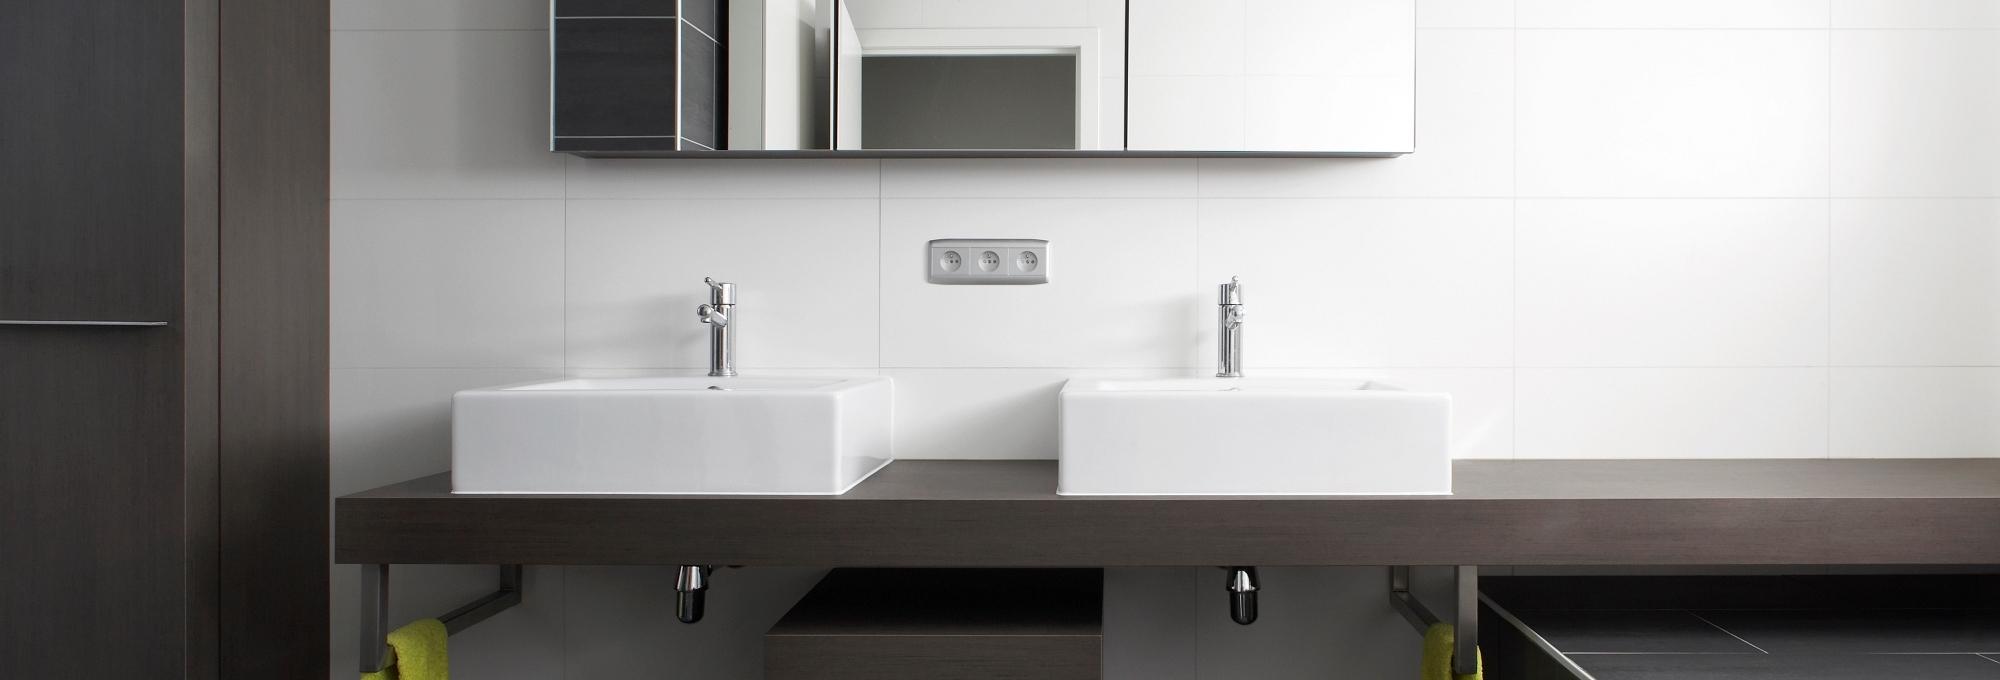 Keukens badkamers totaalinterieur interieur geenen for Interieur badkamer